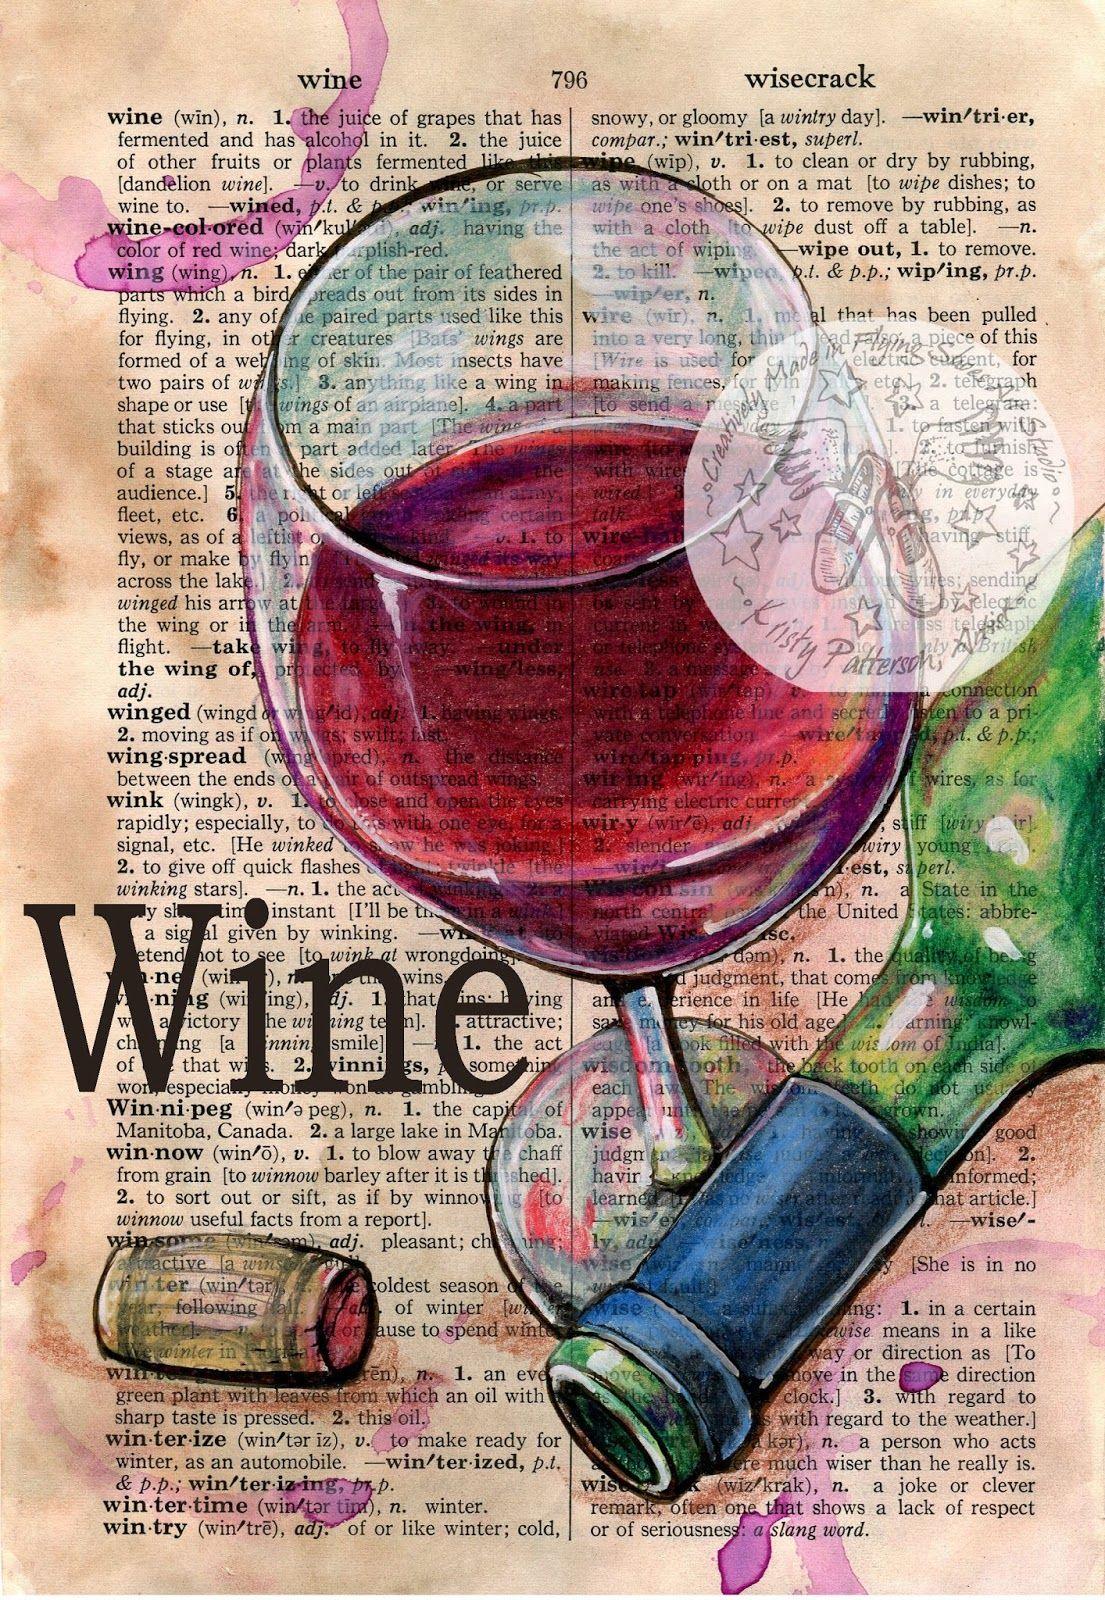 Wine Jpg 1 105 1 600 Pixels Wine Art Book Page Art Book Art